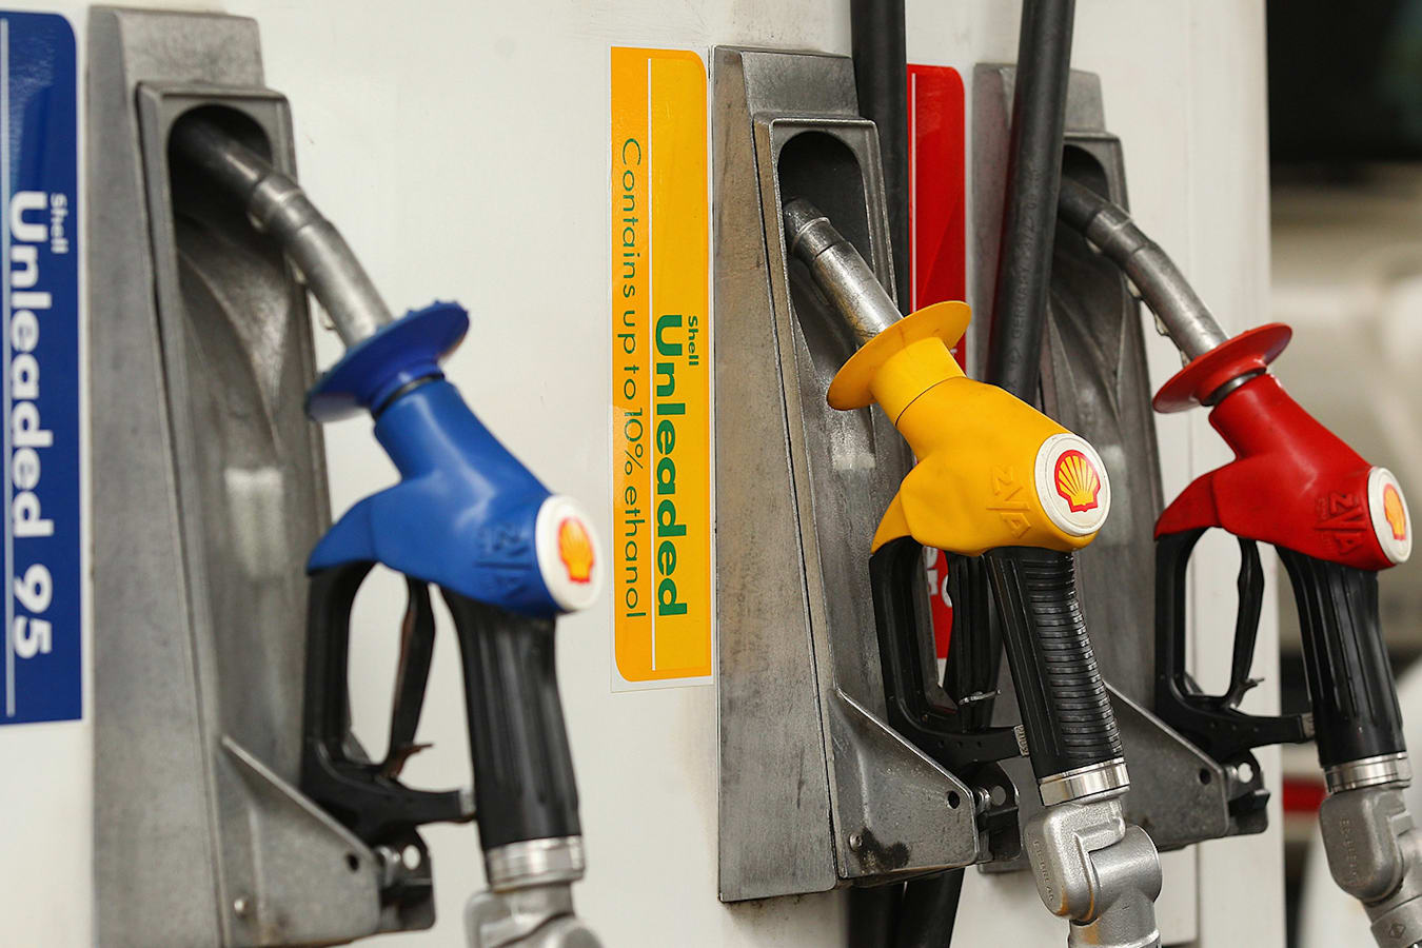 Fuel Nozze Jpg